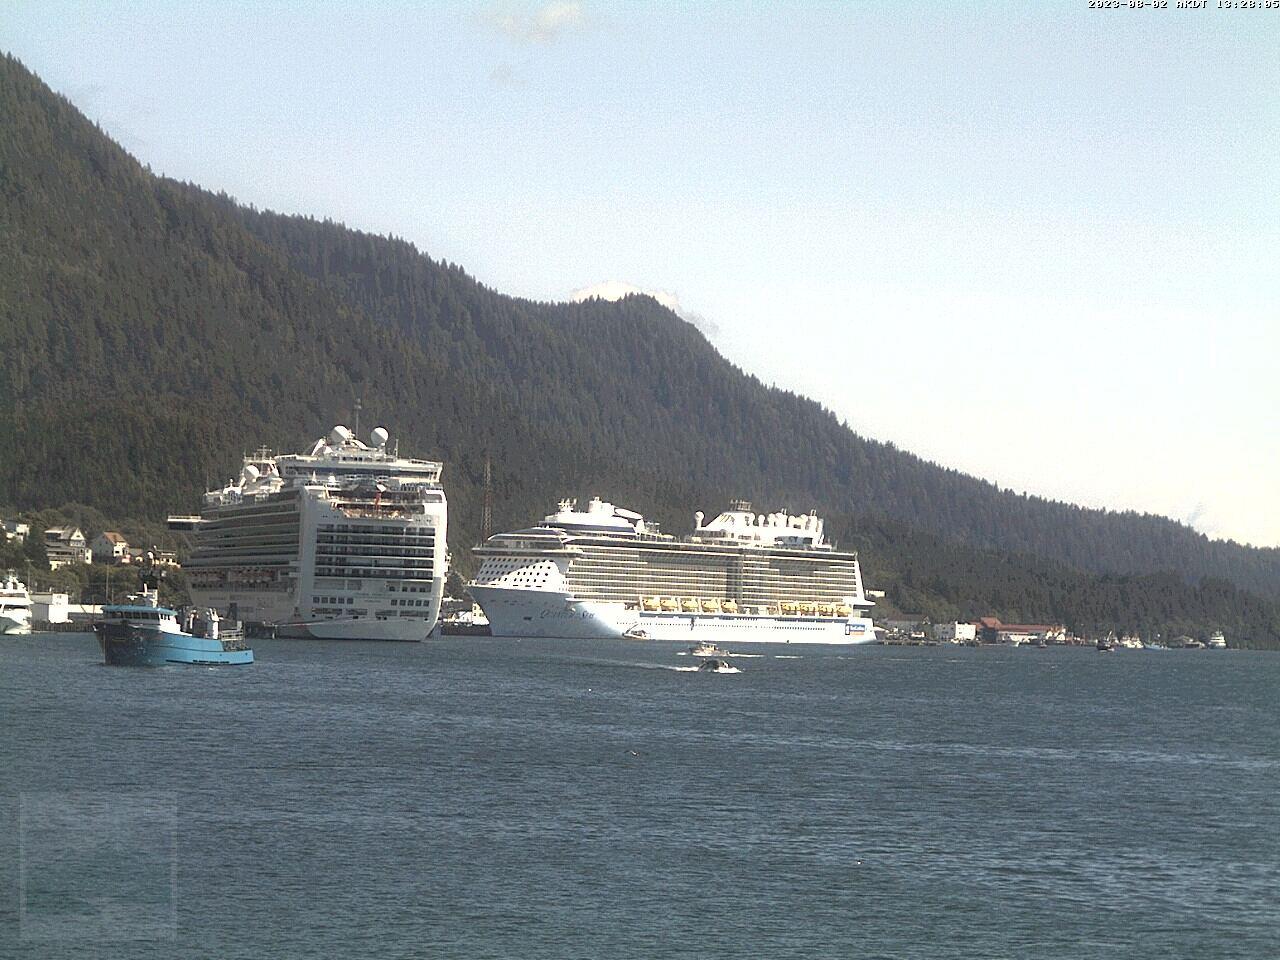 Current Ketchikan Webcam #3 Alaska-sized Image